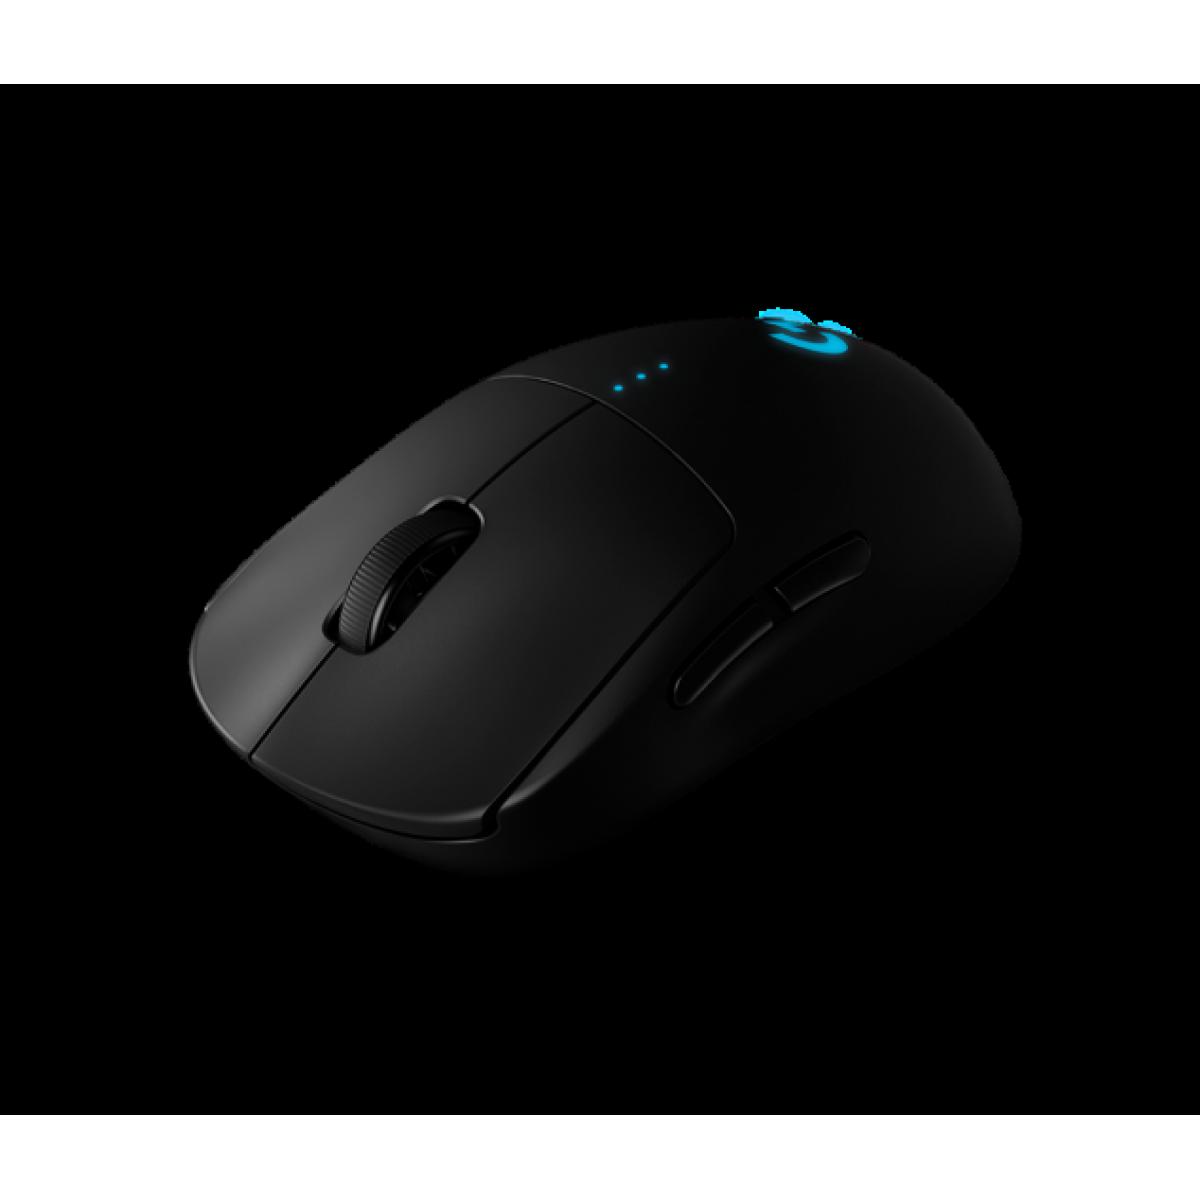 Mouse Gamer Wireless Logitech G PRO, 16.000DPI, 6 Botões Programáveis, RGB, Black, 910-005271